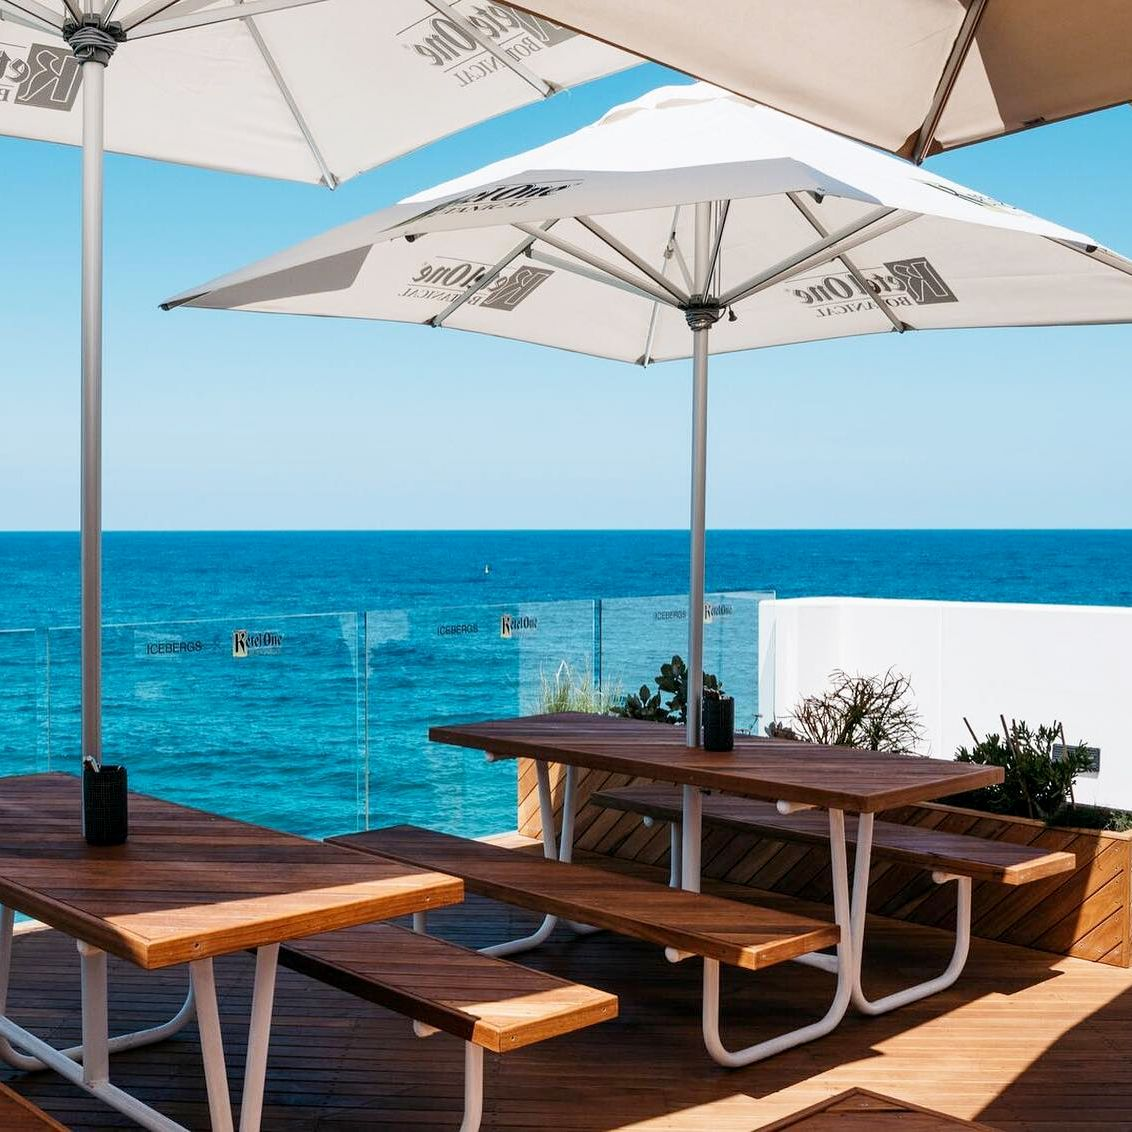 Shade Australia's List of Best Market Umbrellas of 2021